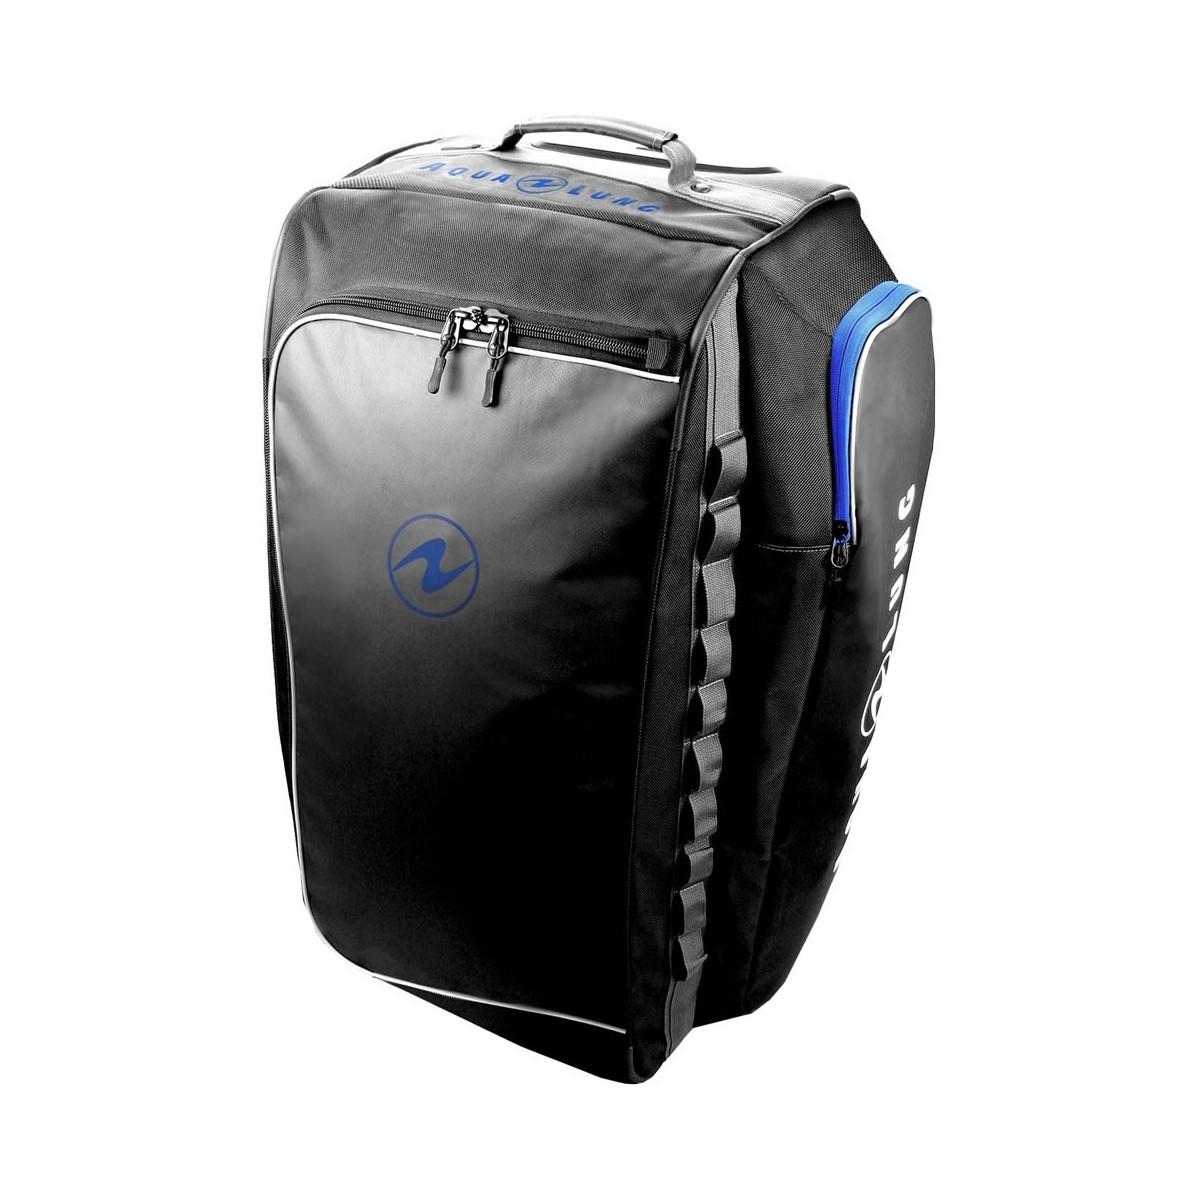 Aqua lung Explorer Collection Roller Bag